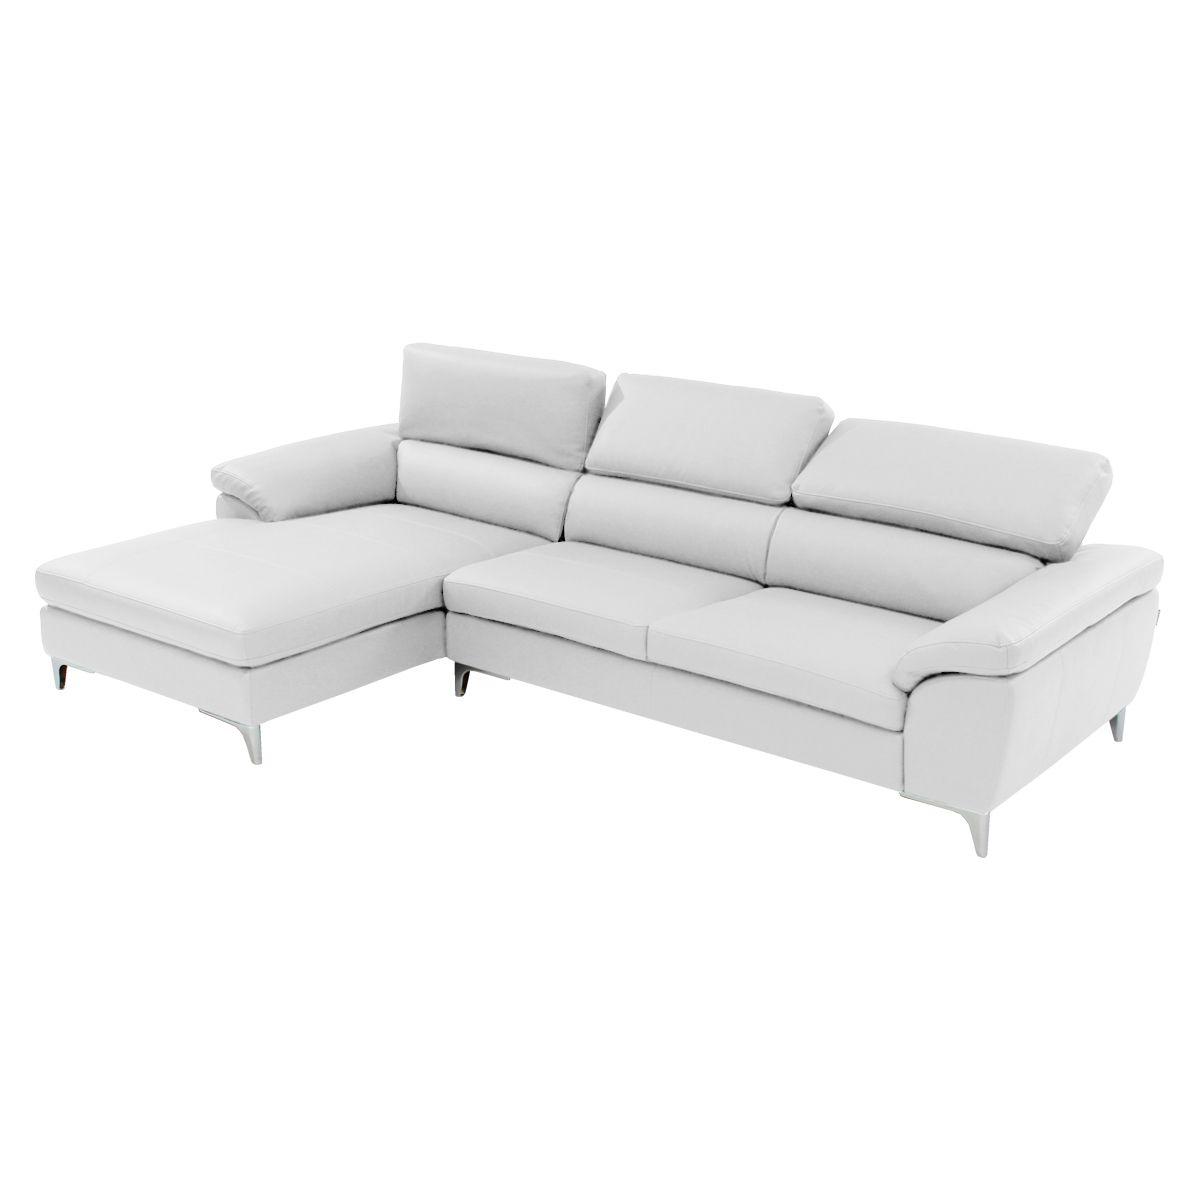 Costa White Corner Sofa W Left Chaise White Corner Sofas Sofa Corner Sofa